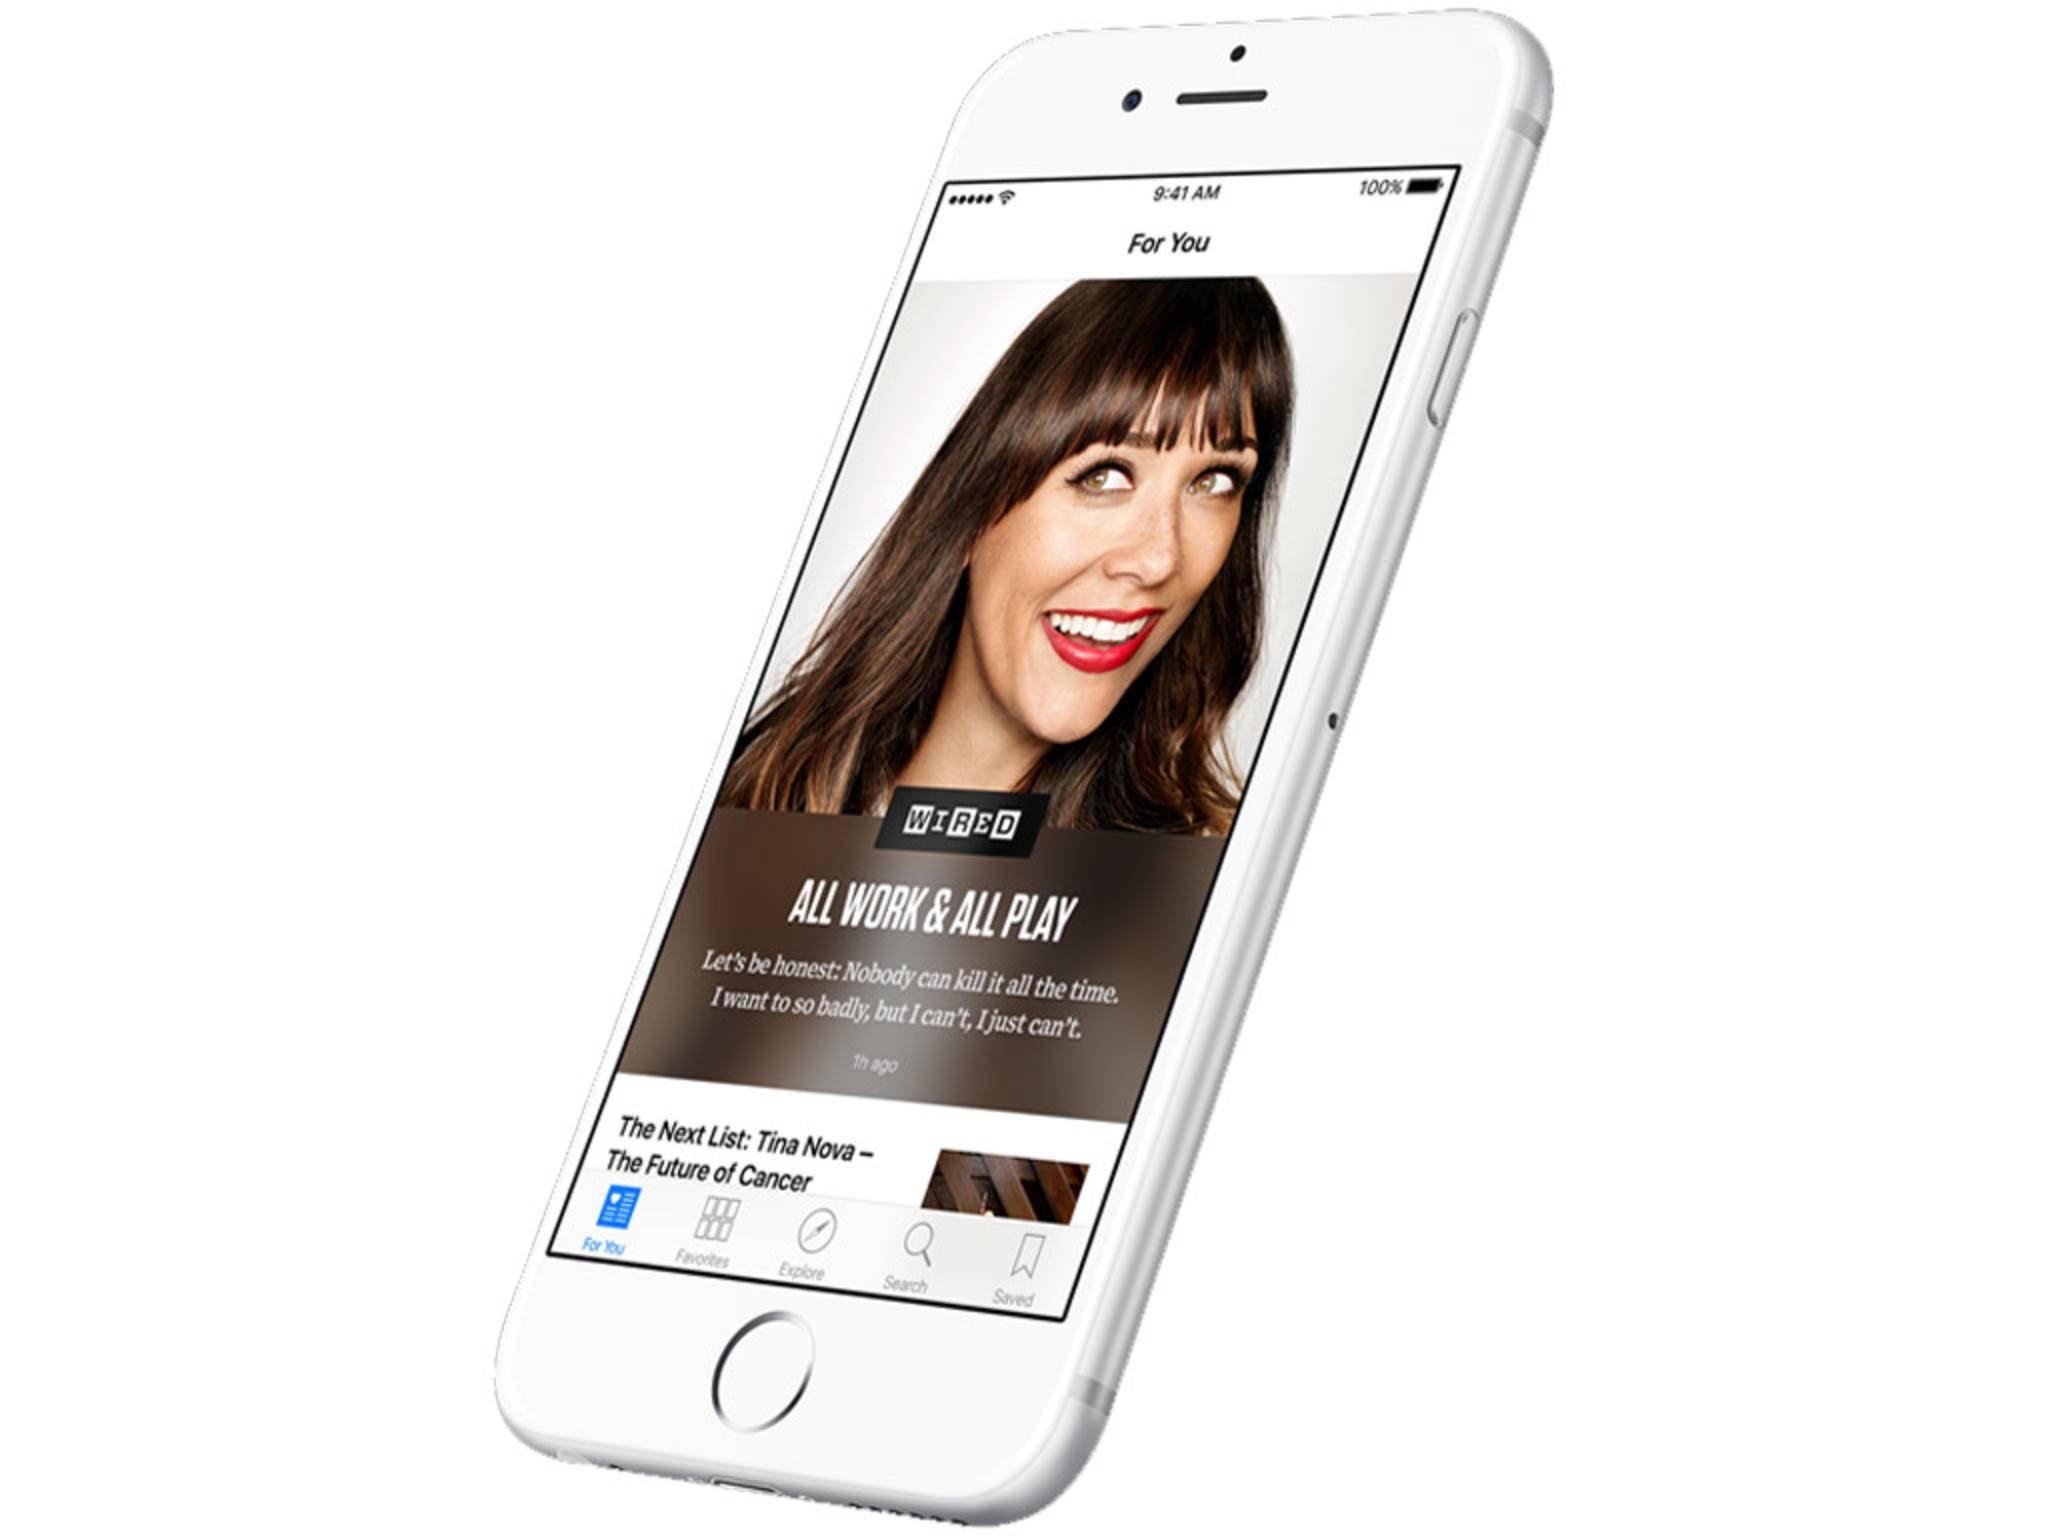 iOS9 Beta News